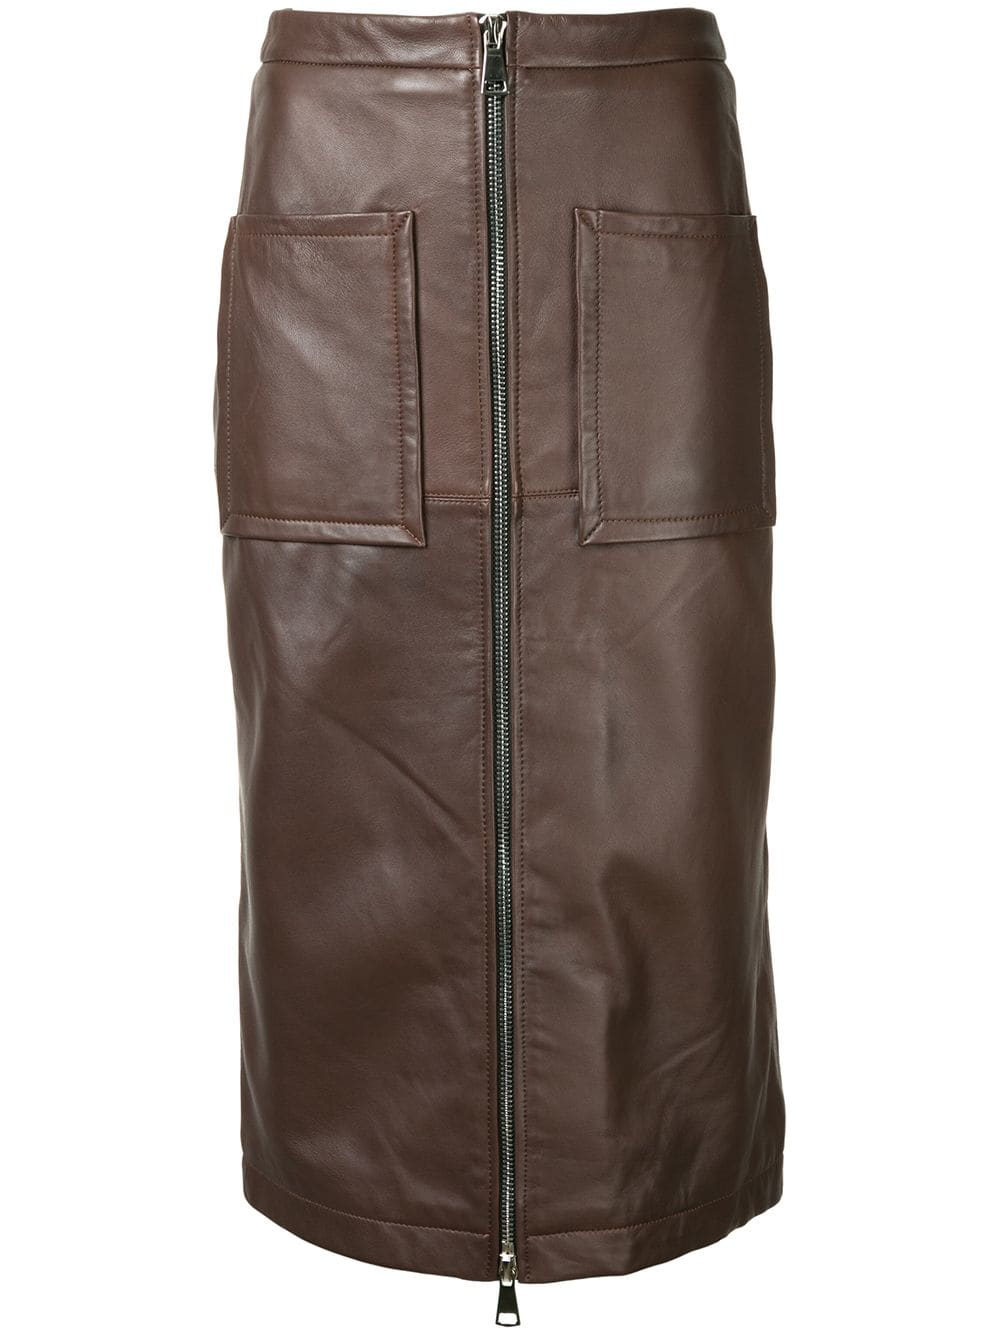 Manning Cartell midi skirt - shop